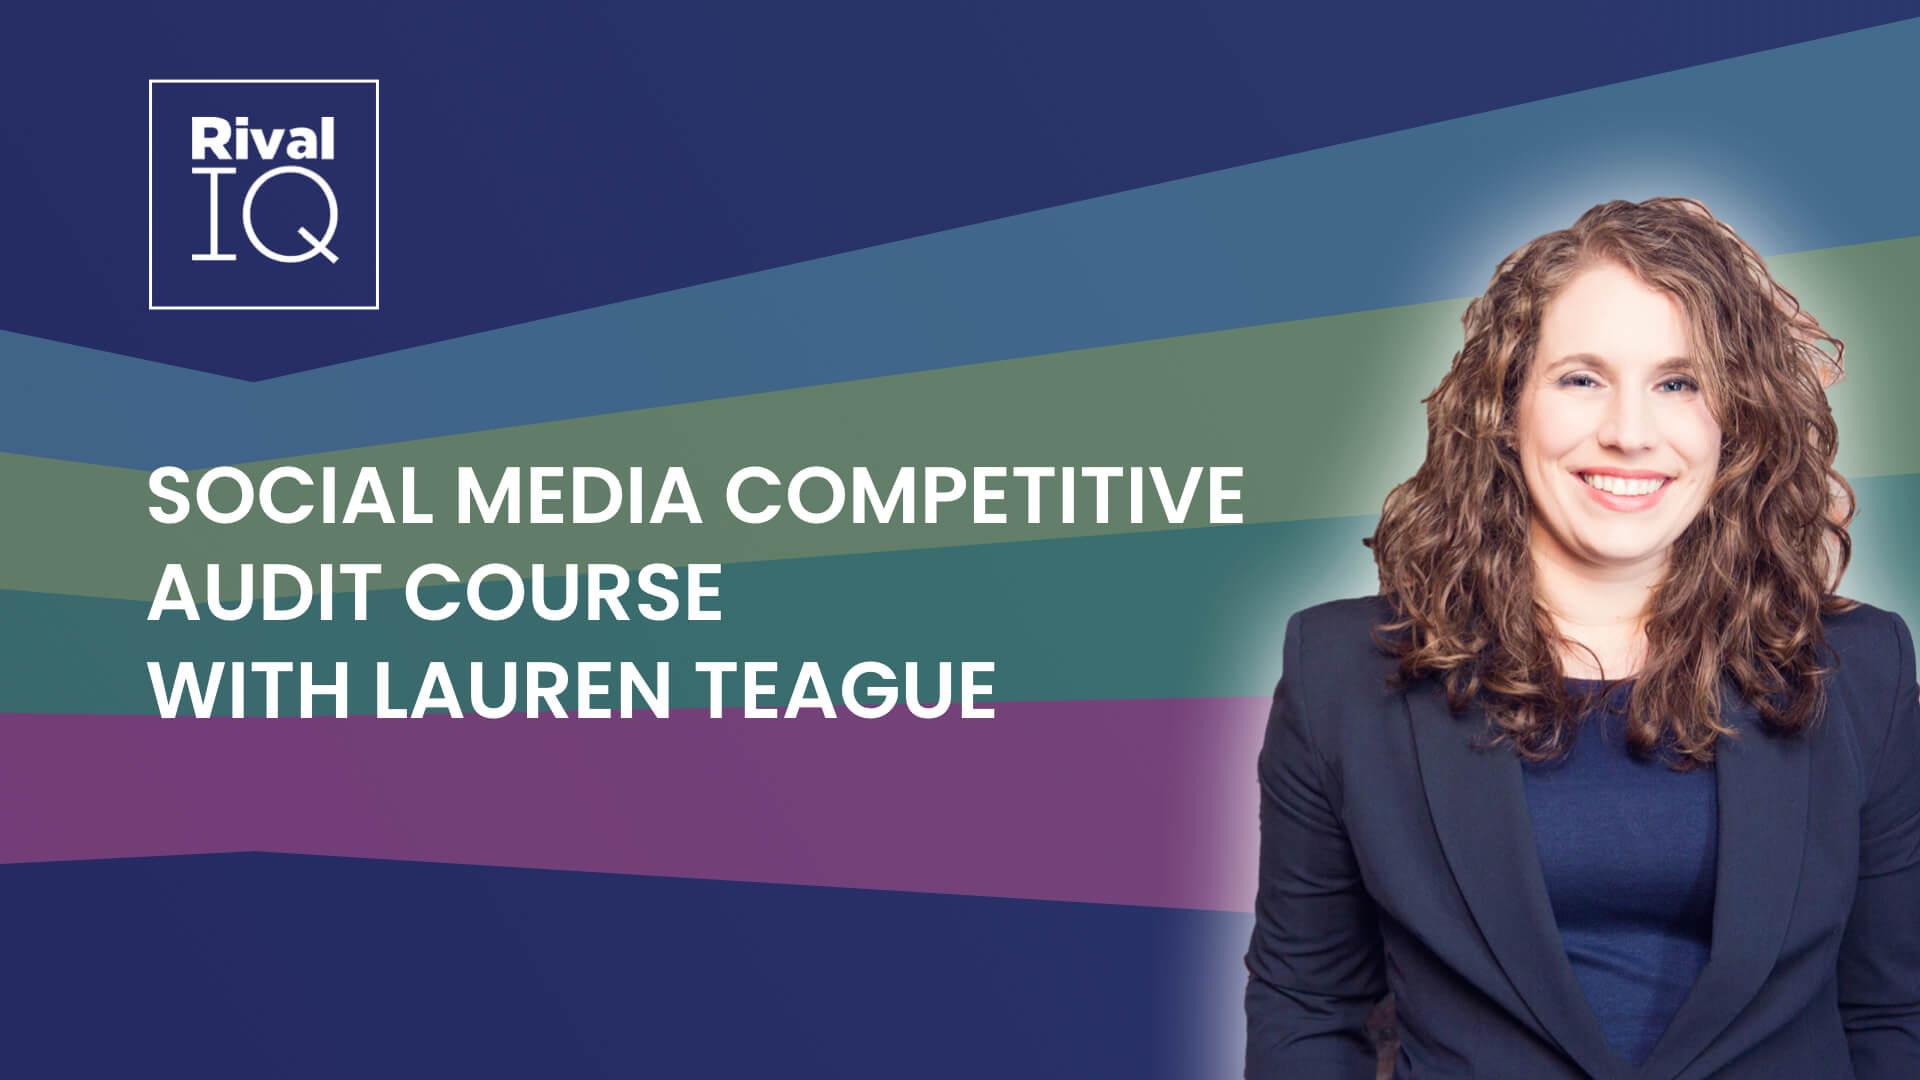 Social Media Competitive Audit Course